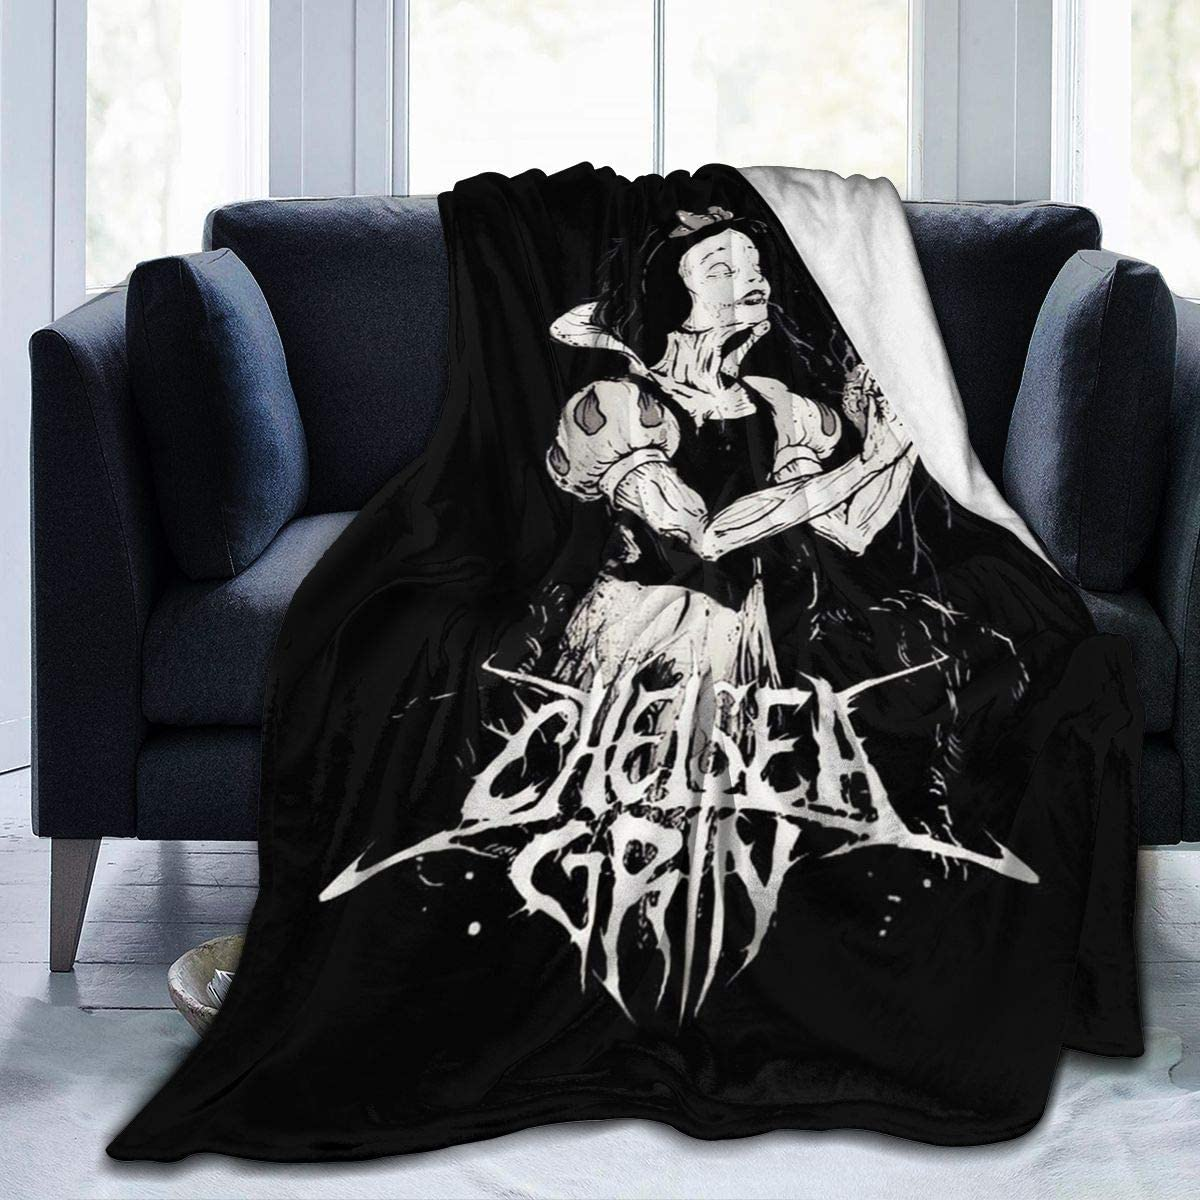 WushXiao Chelsea Grin Blanket Ultra-Soft Fleece Al price Micro 55% OFF